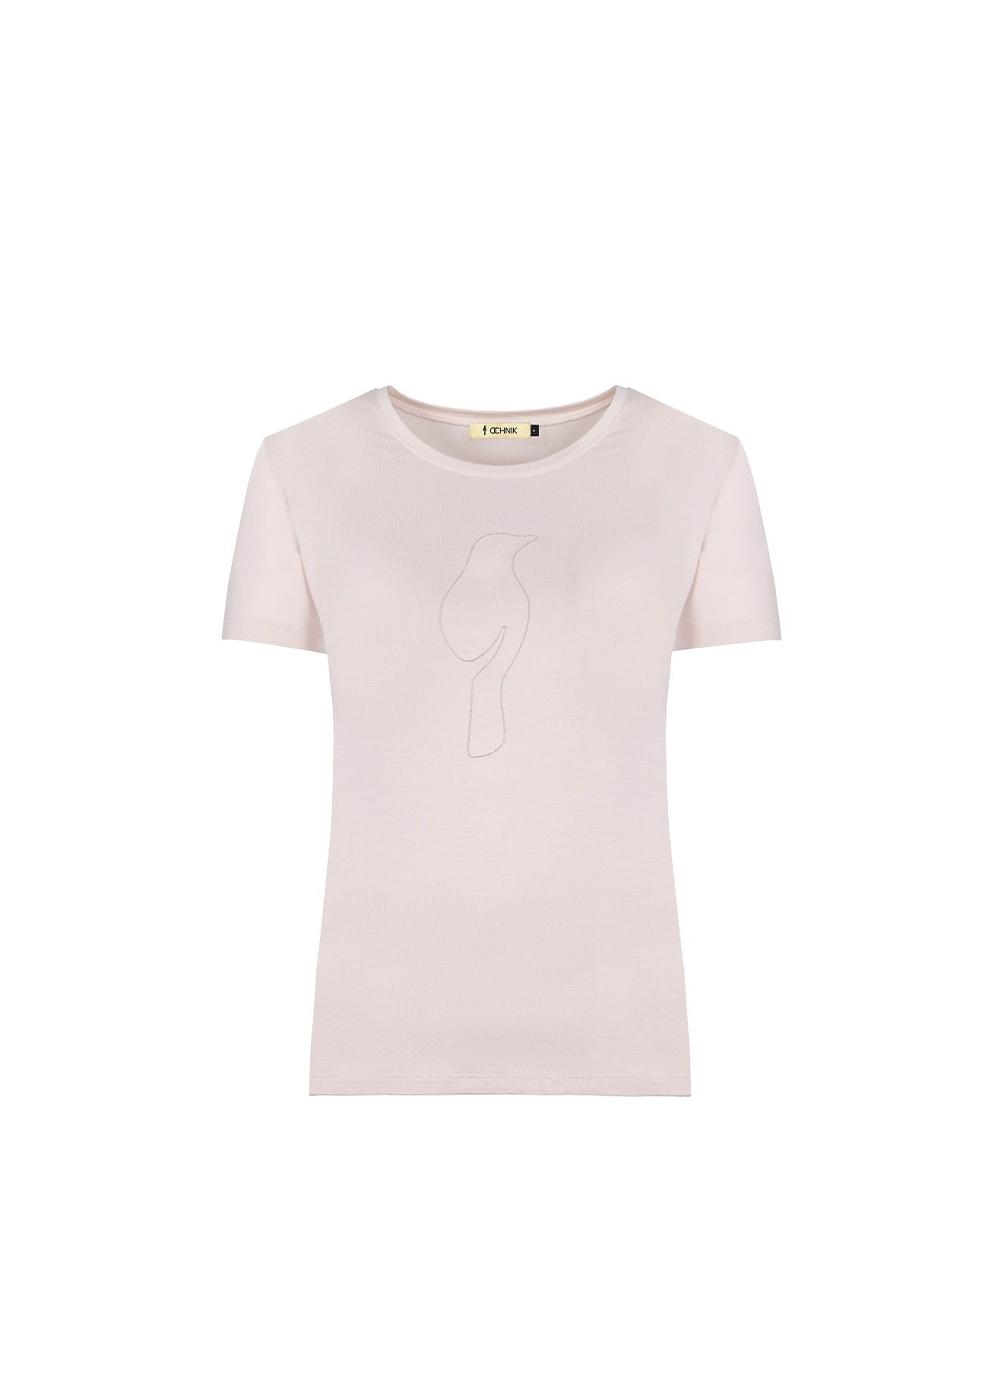 T-shirt damski TSHDT-0025-31(W19)